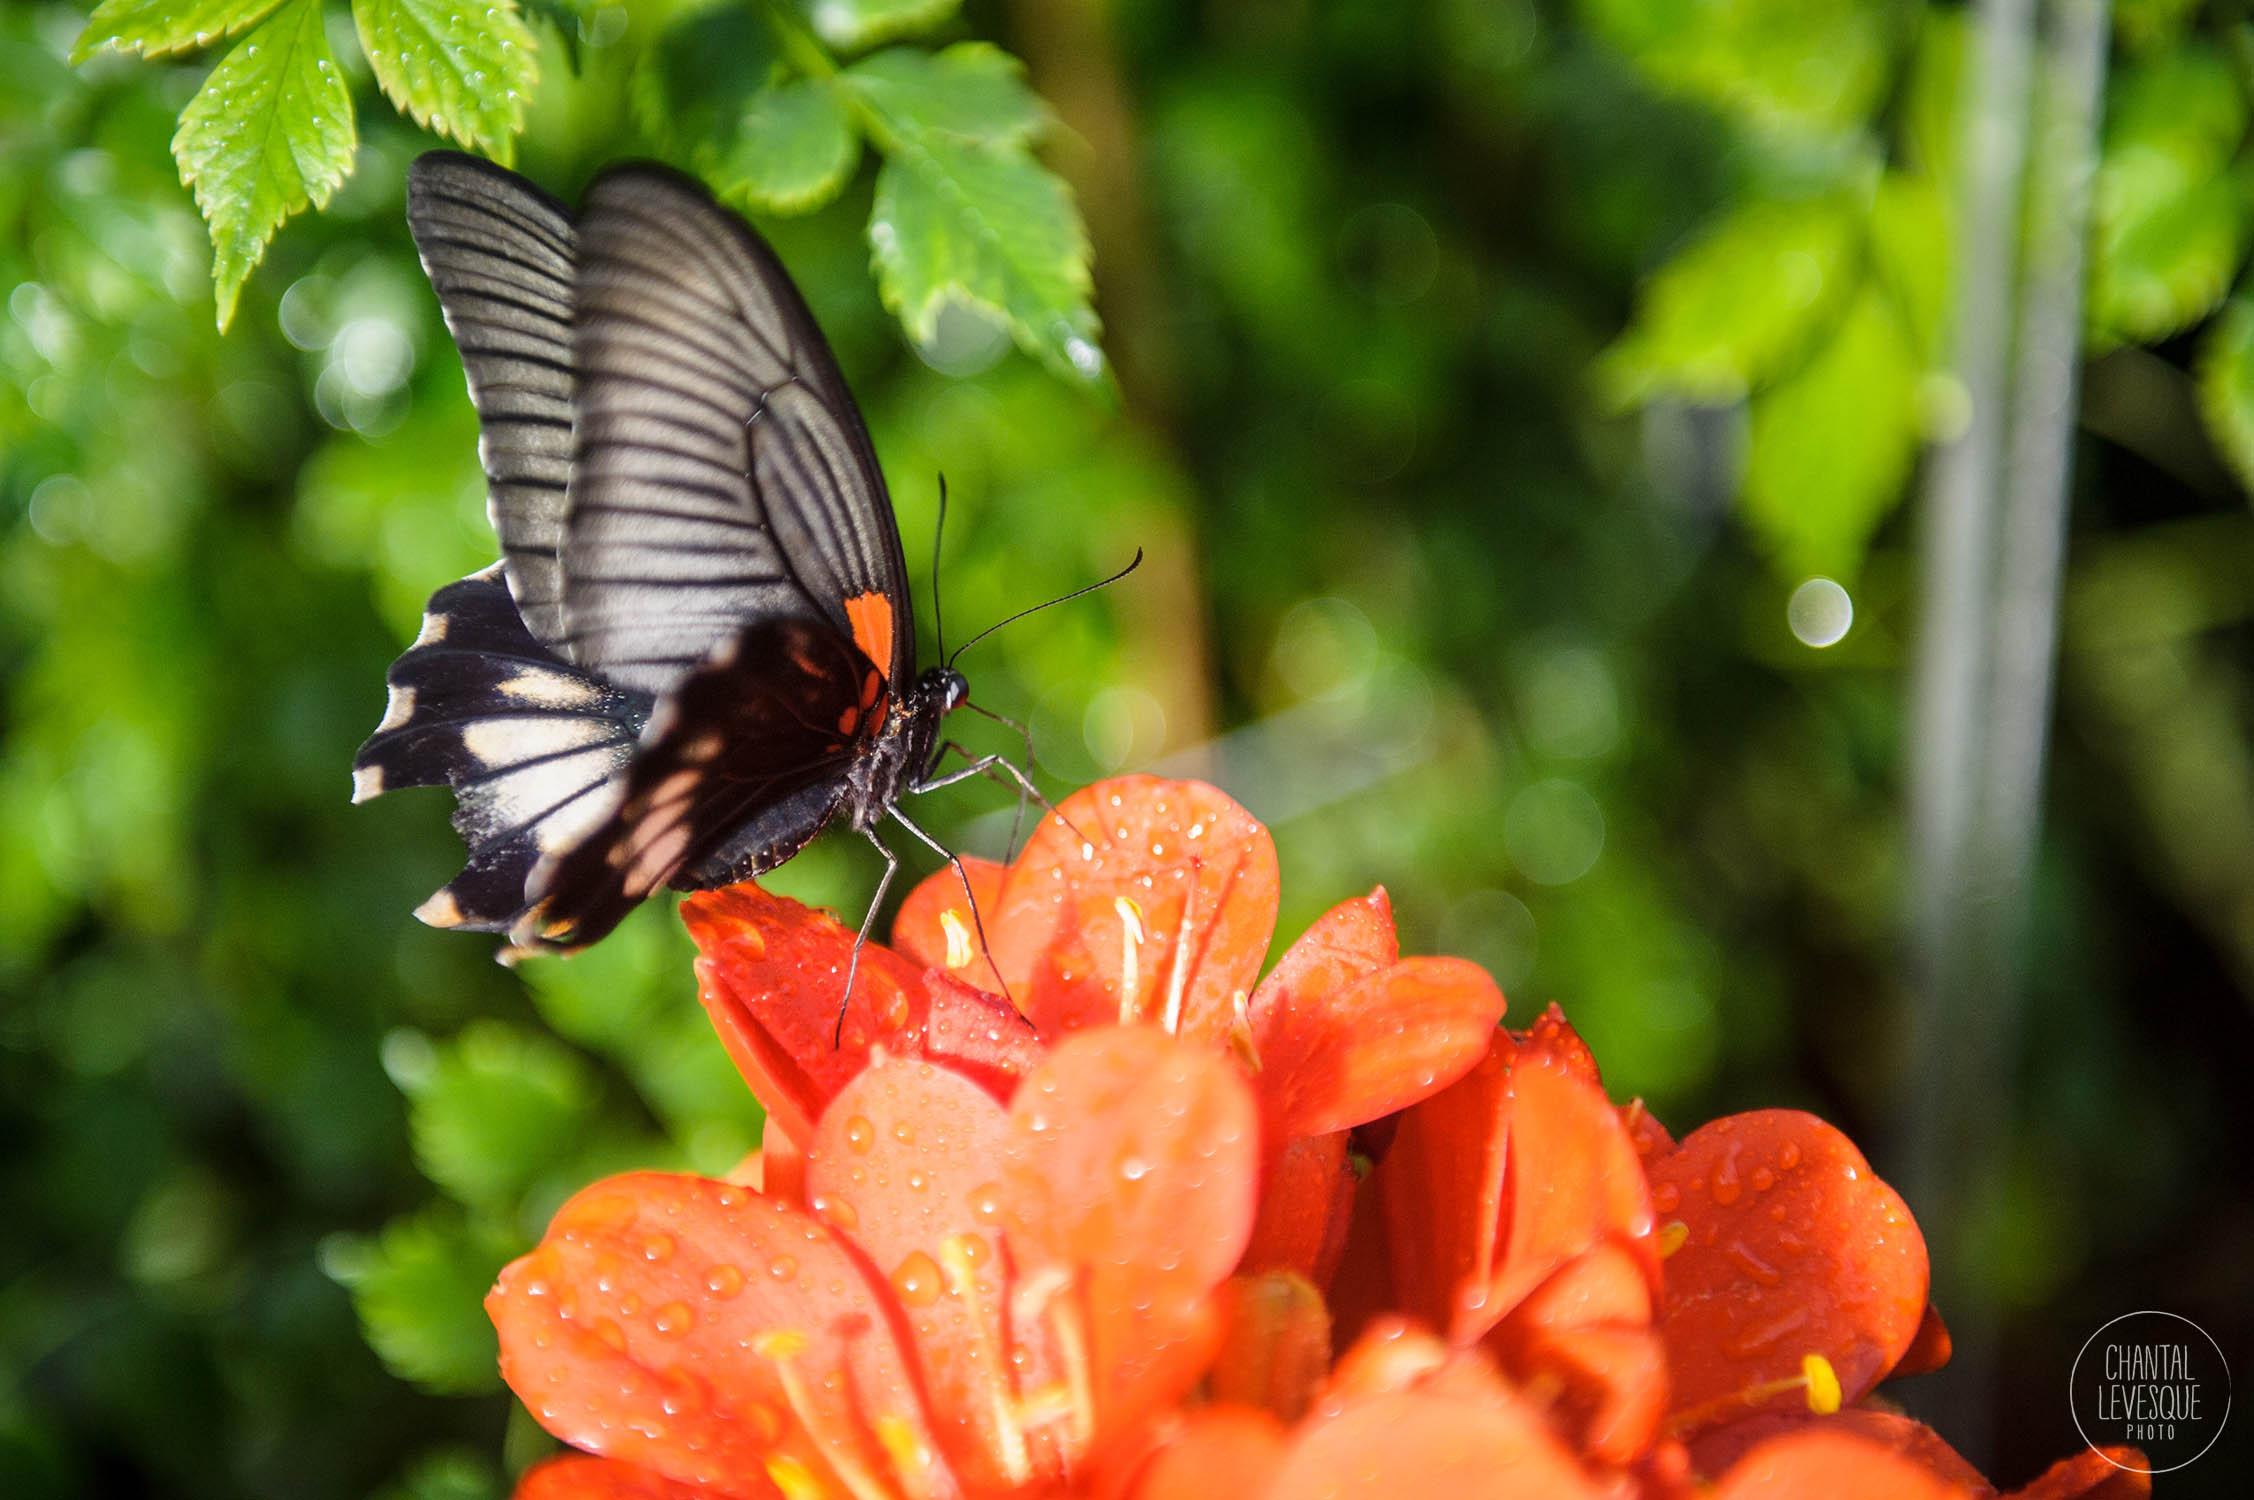 papillons-3508 copy.jpg